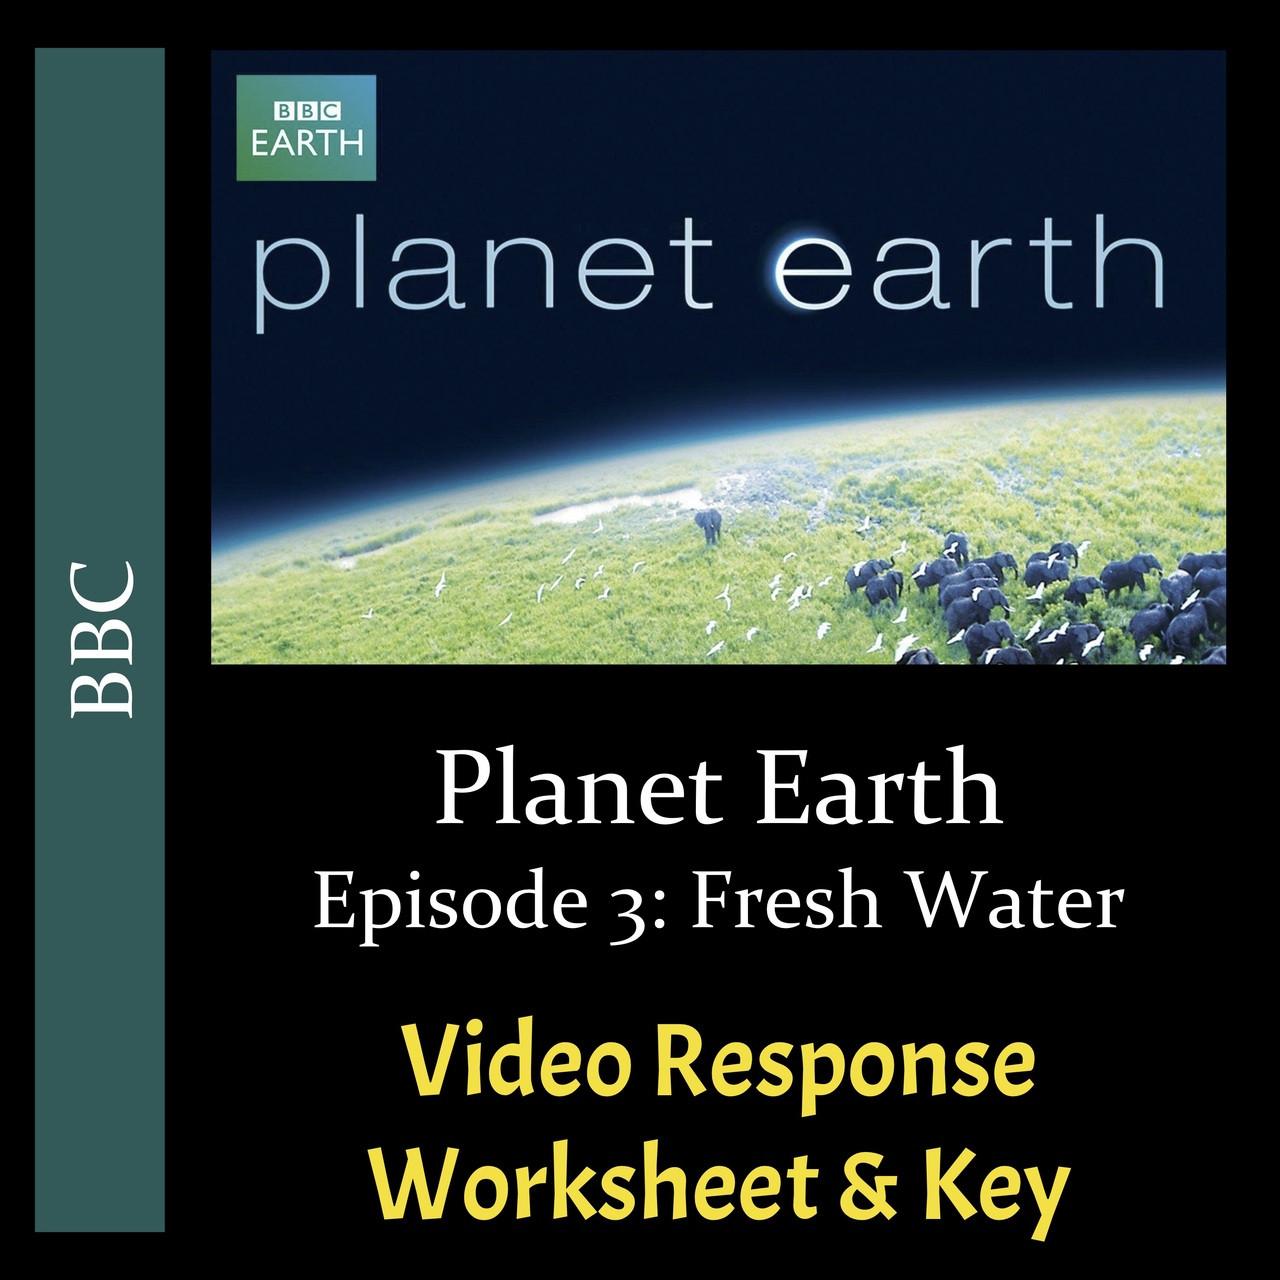 Planet Earth - Episode 3: Fresh Water - Video Response Worksheet & Key  (Editable)